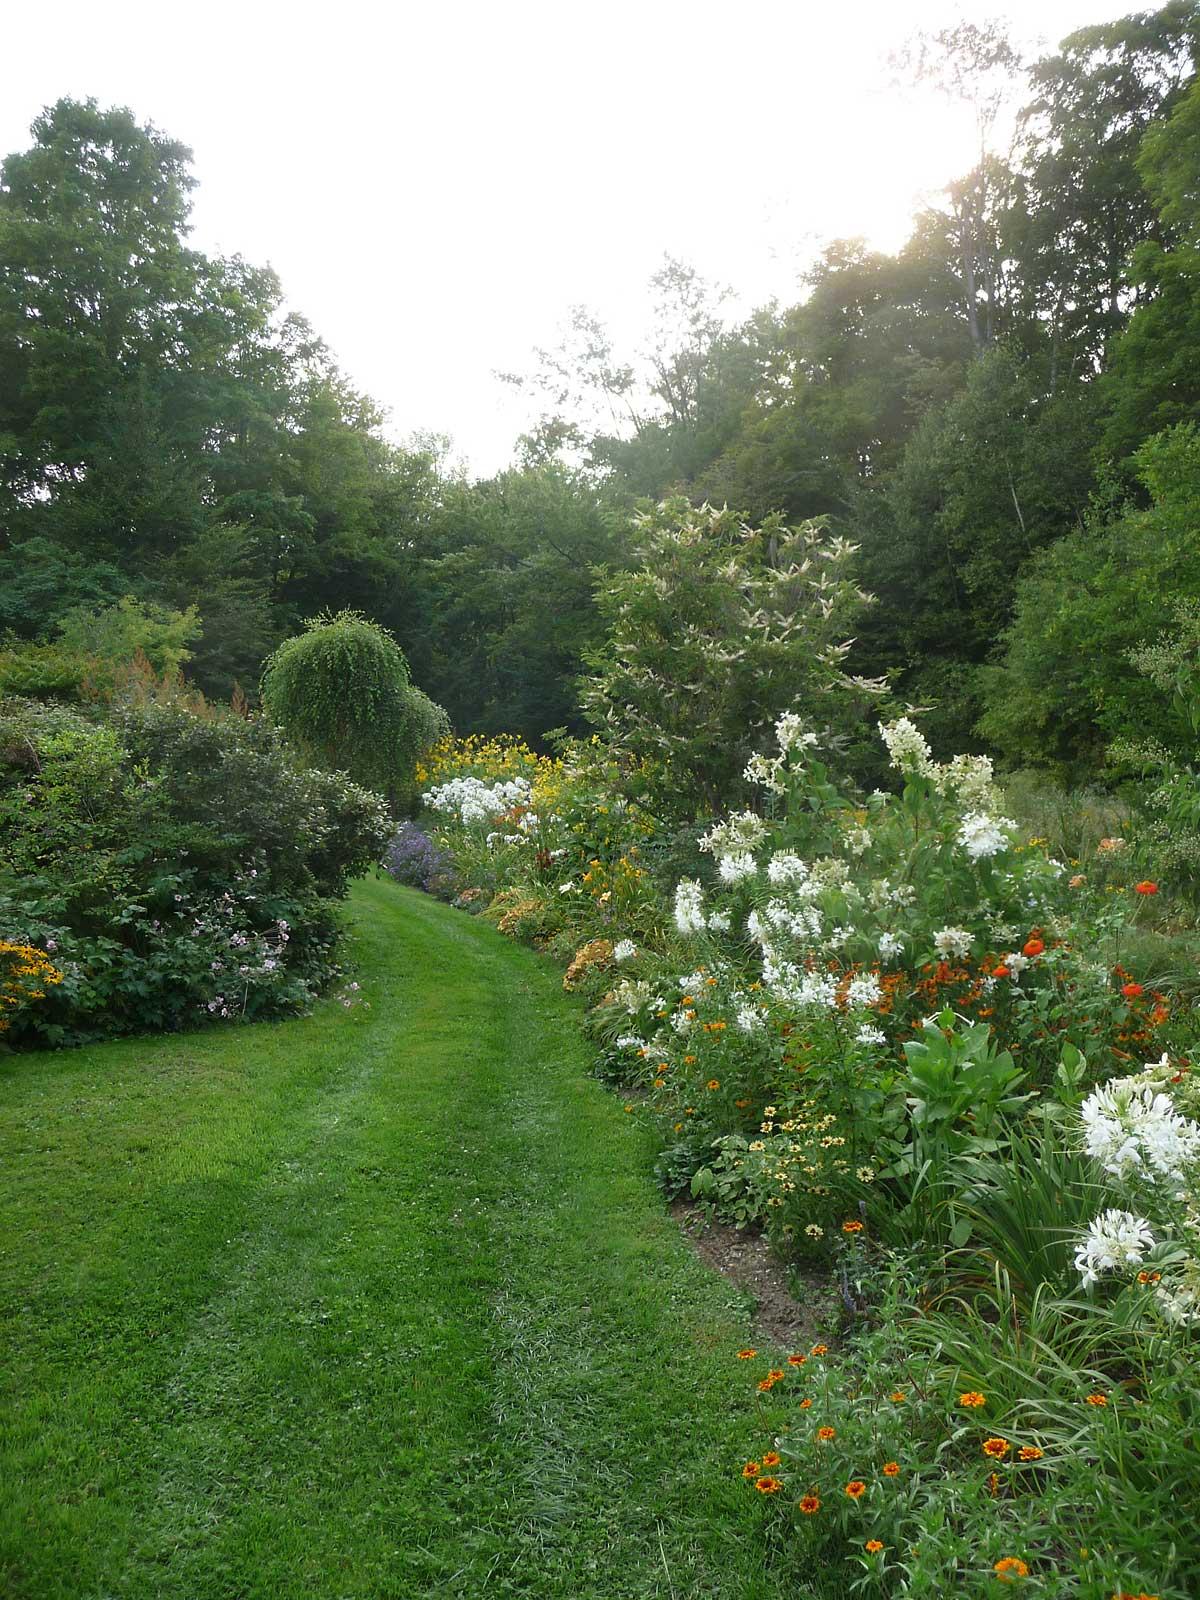 West lower garden with Hydrangeas, Phlox, and Hemerocallis